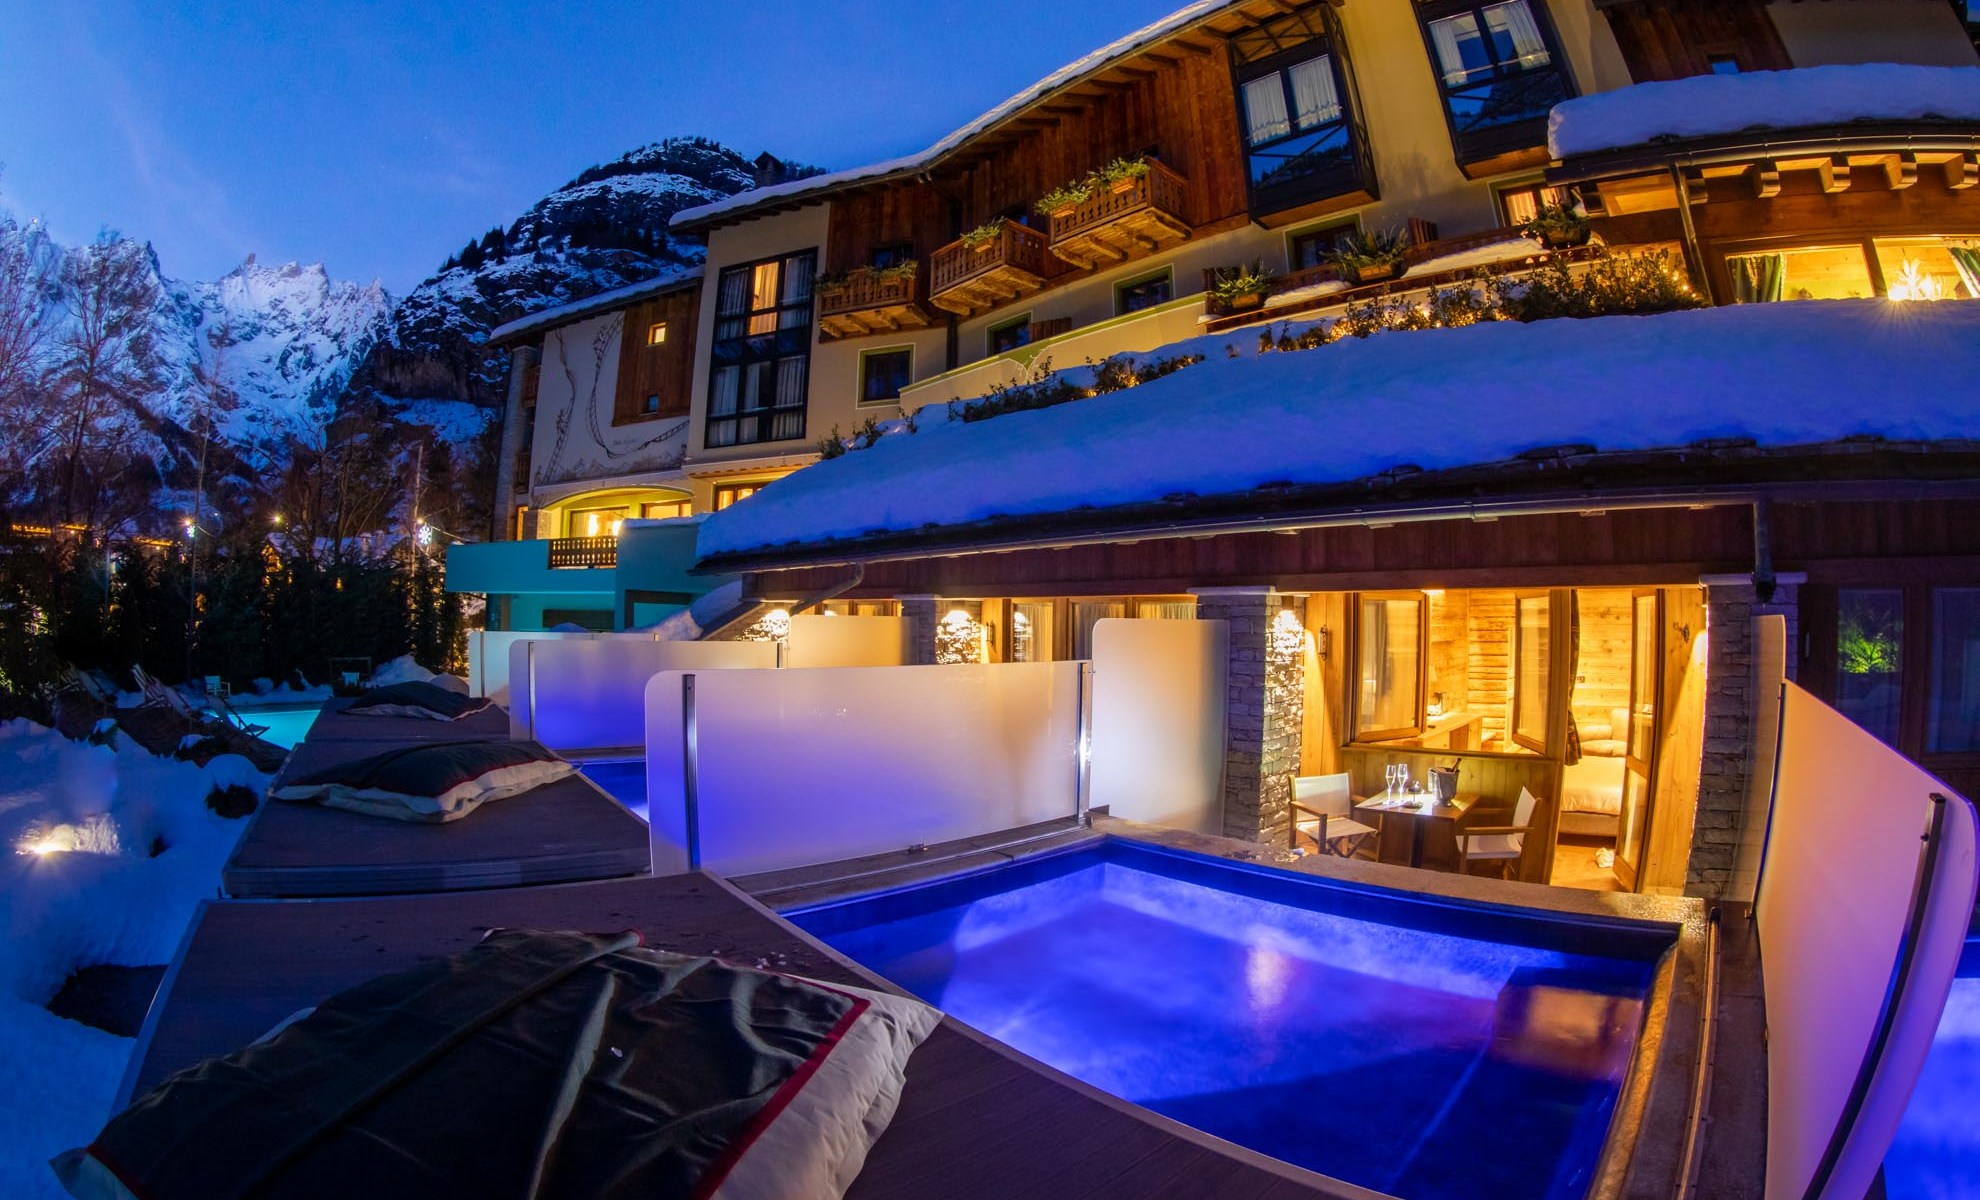 Gran Baita Executive room with outside pool with jacuzzi. Photo: Gran Baita Hotel Courmayeur. Spot on: Gran Baita Hotel – Courmayeur